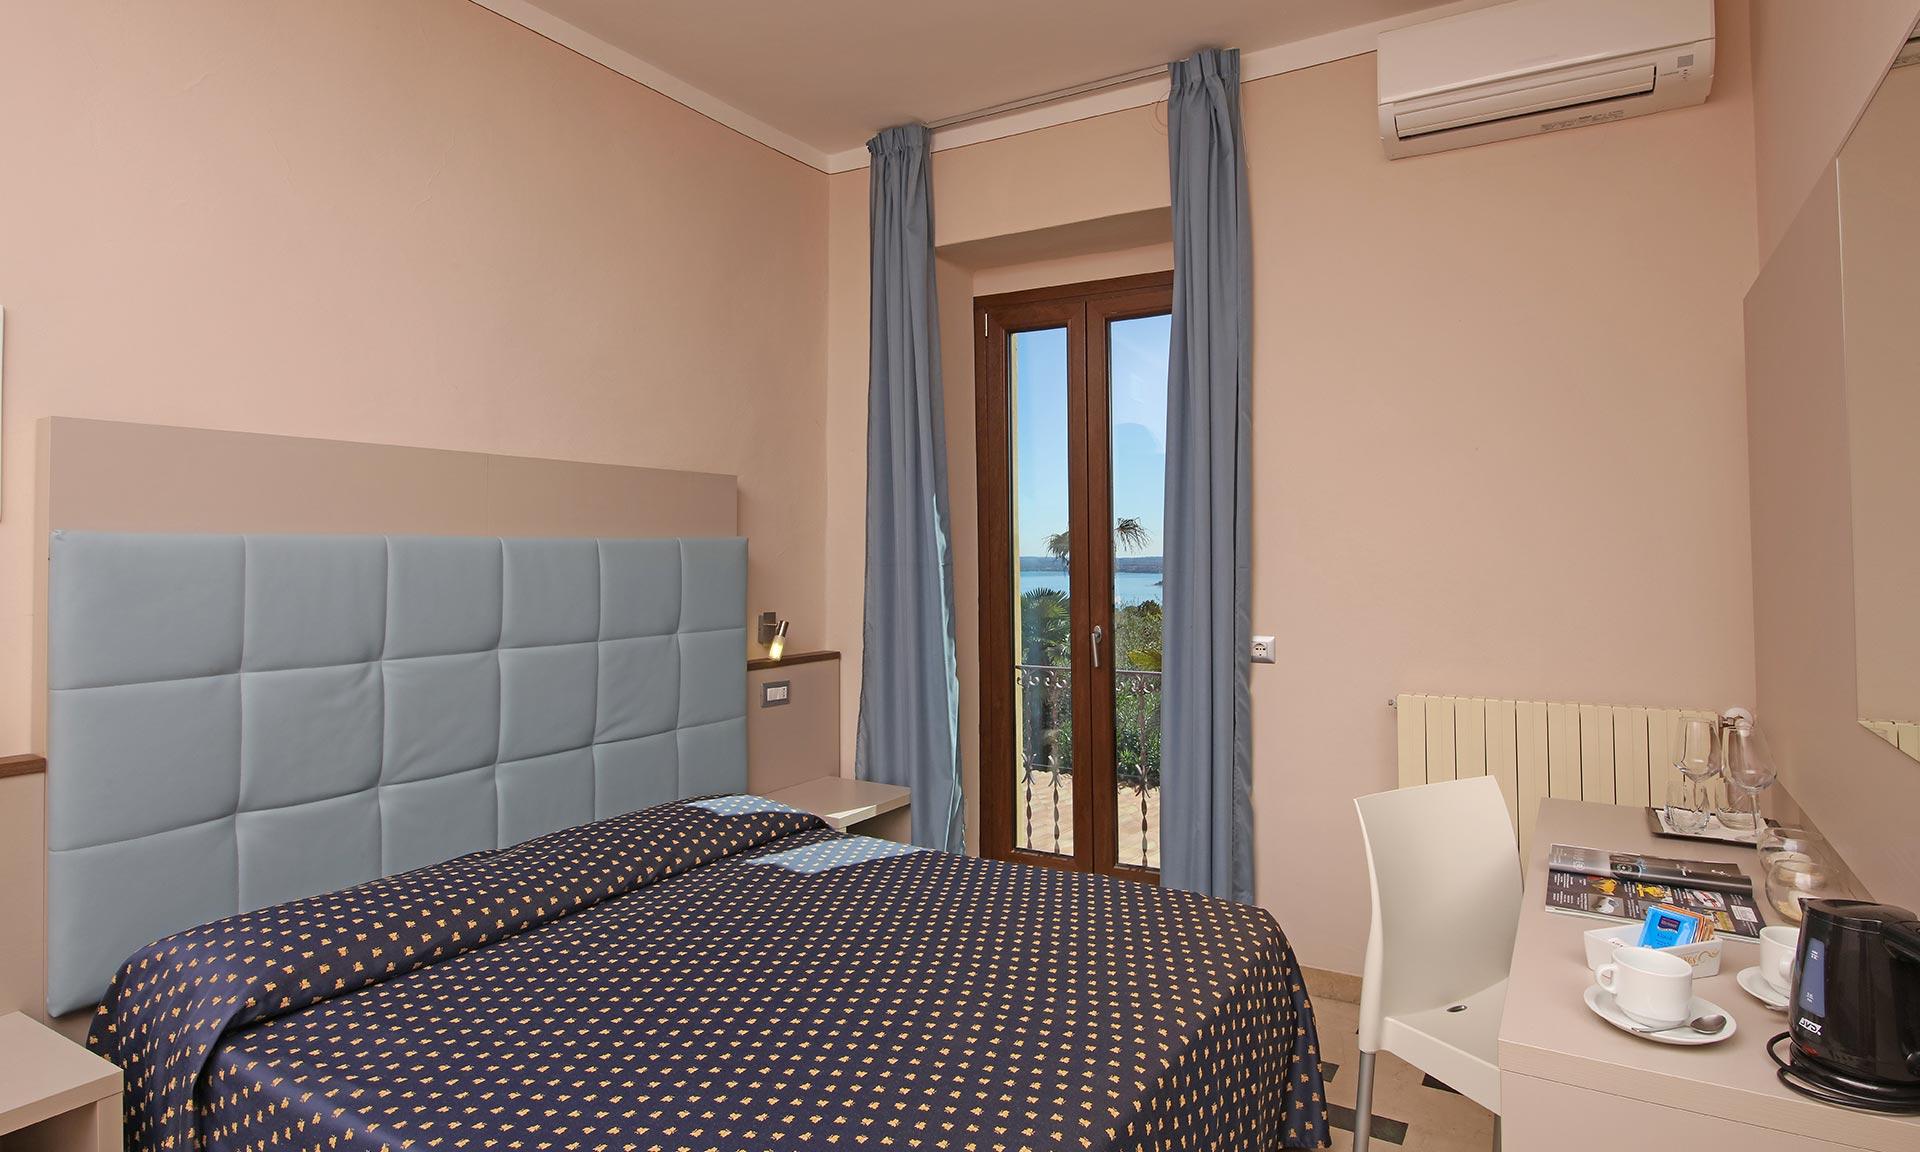 Holiday apartments in residences on Lake Garda Soiano